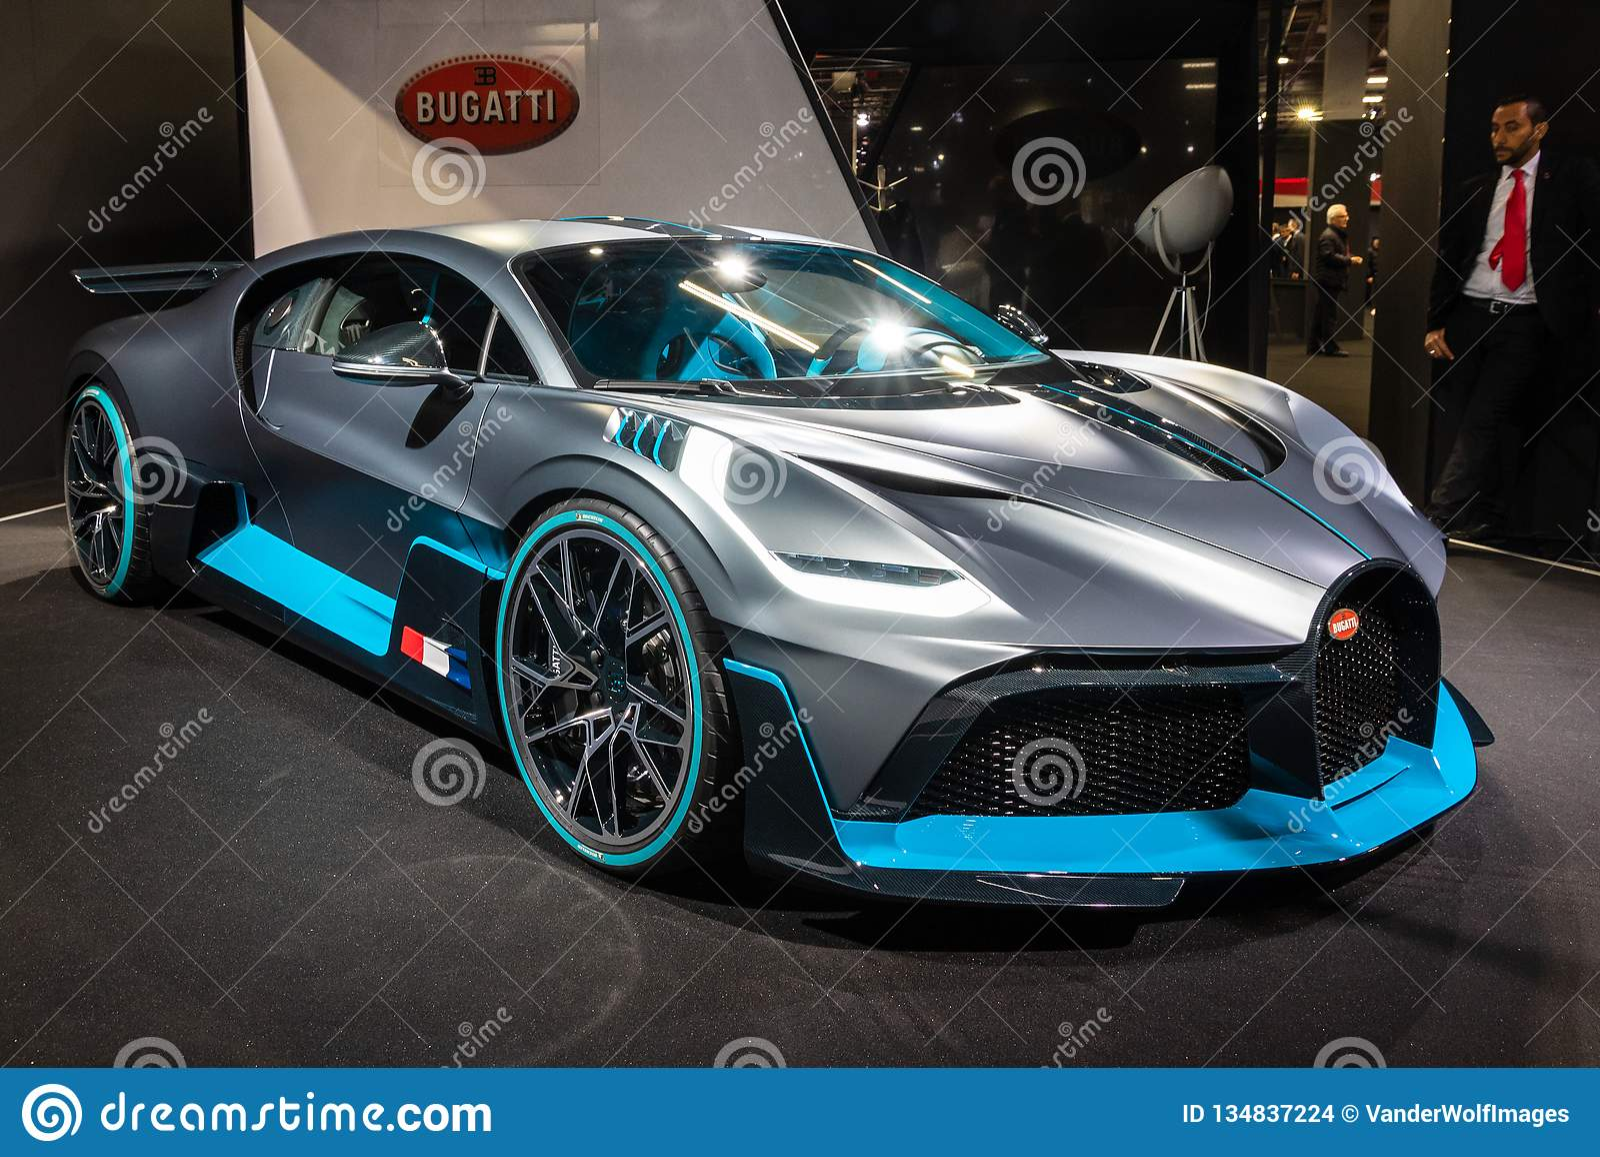 New 2020 Bugatti Divo Extreme Hypercar Editorial Stock ...